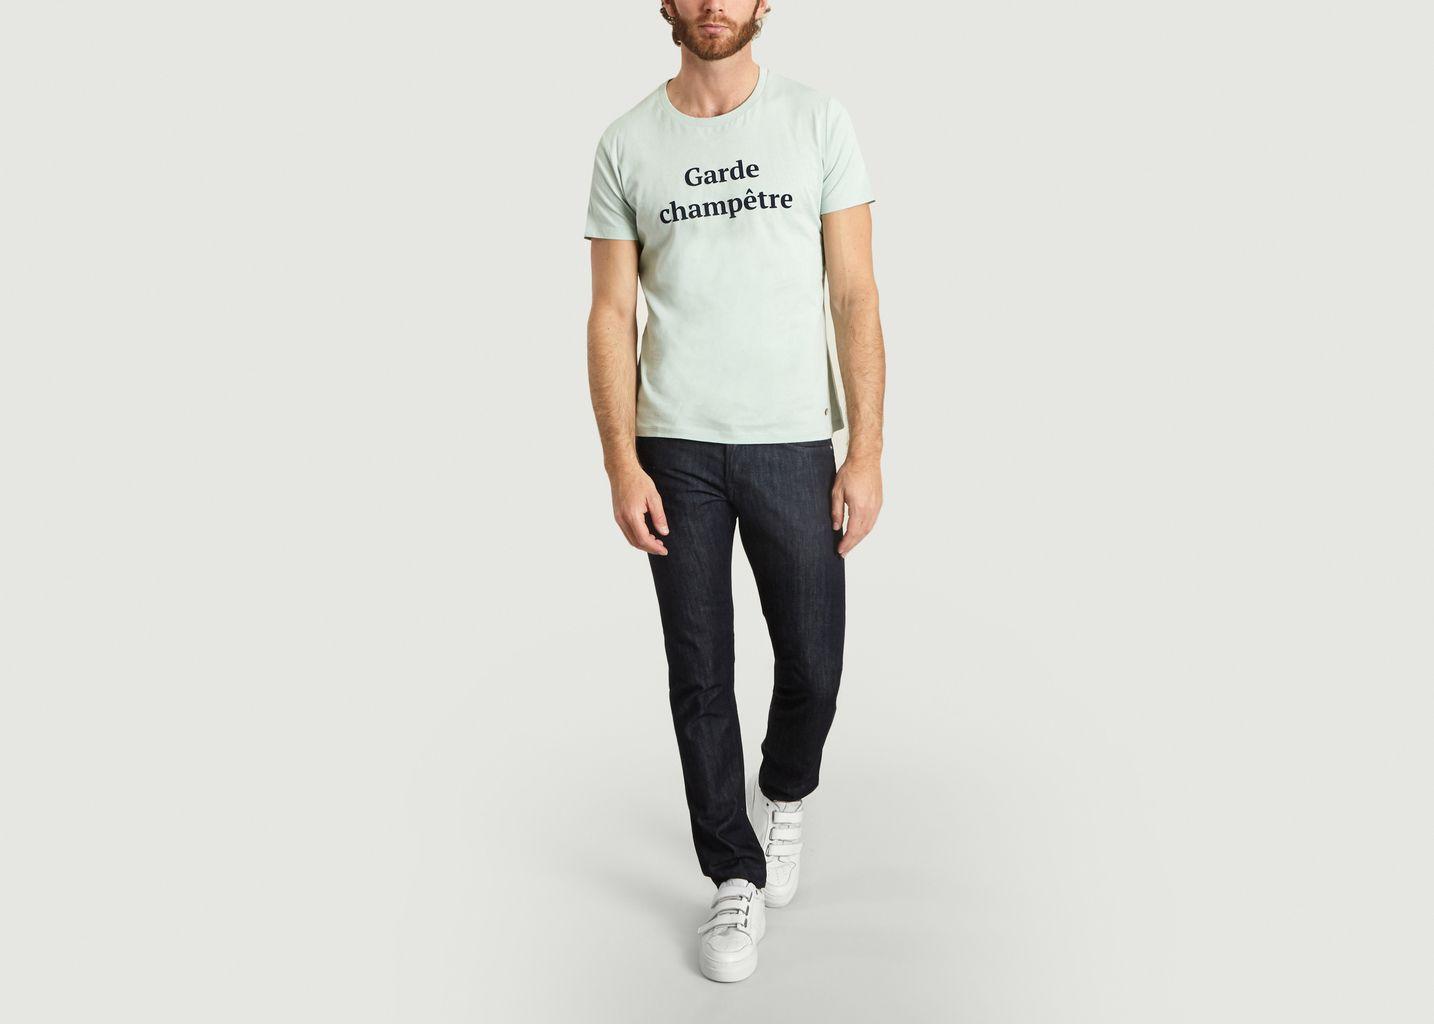 T-shirt Arcy Garde Champêtre - Faguo